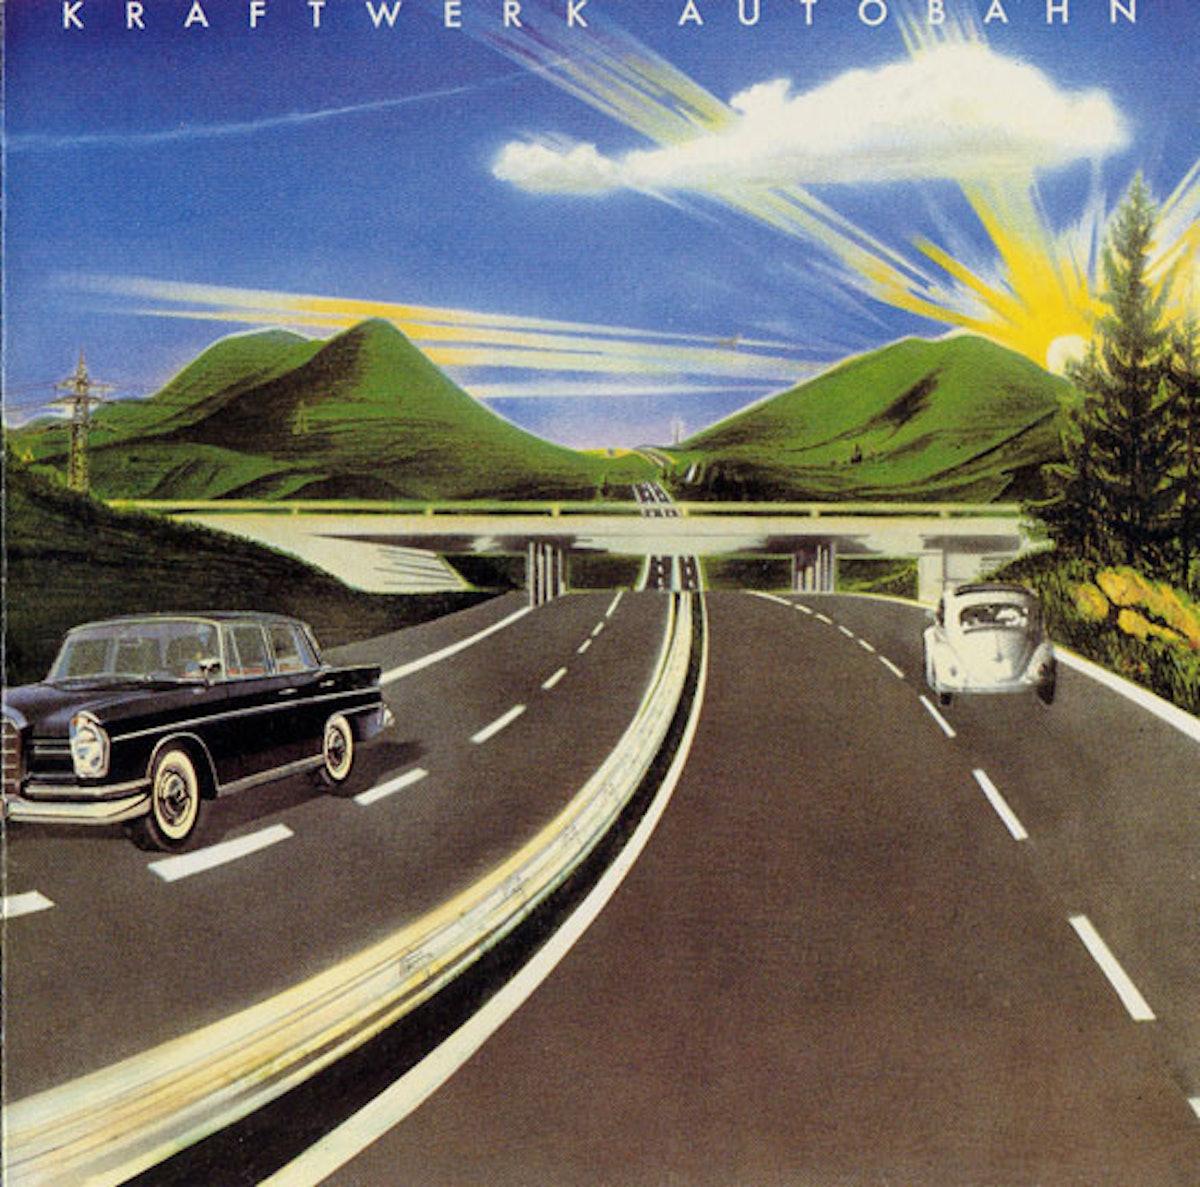 blog-Kraftwerk-Autobahn.jpg